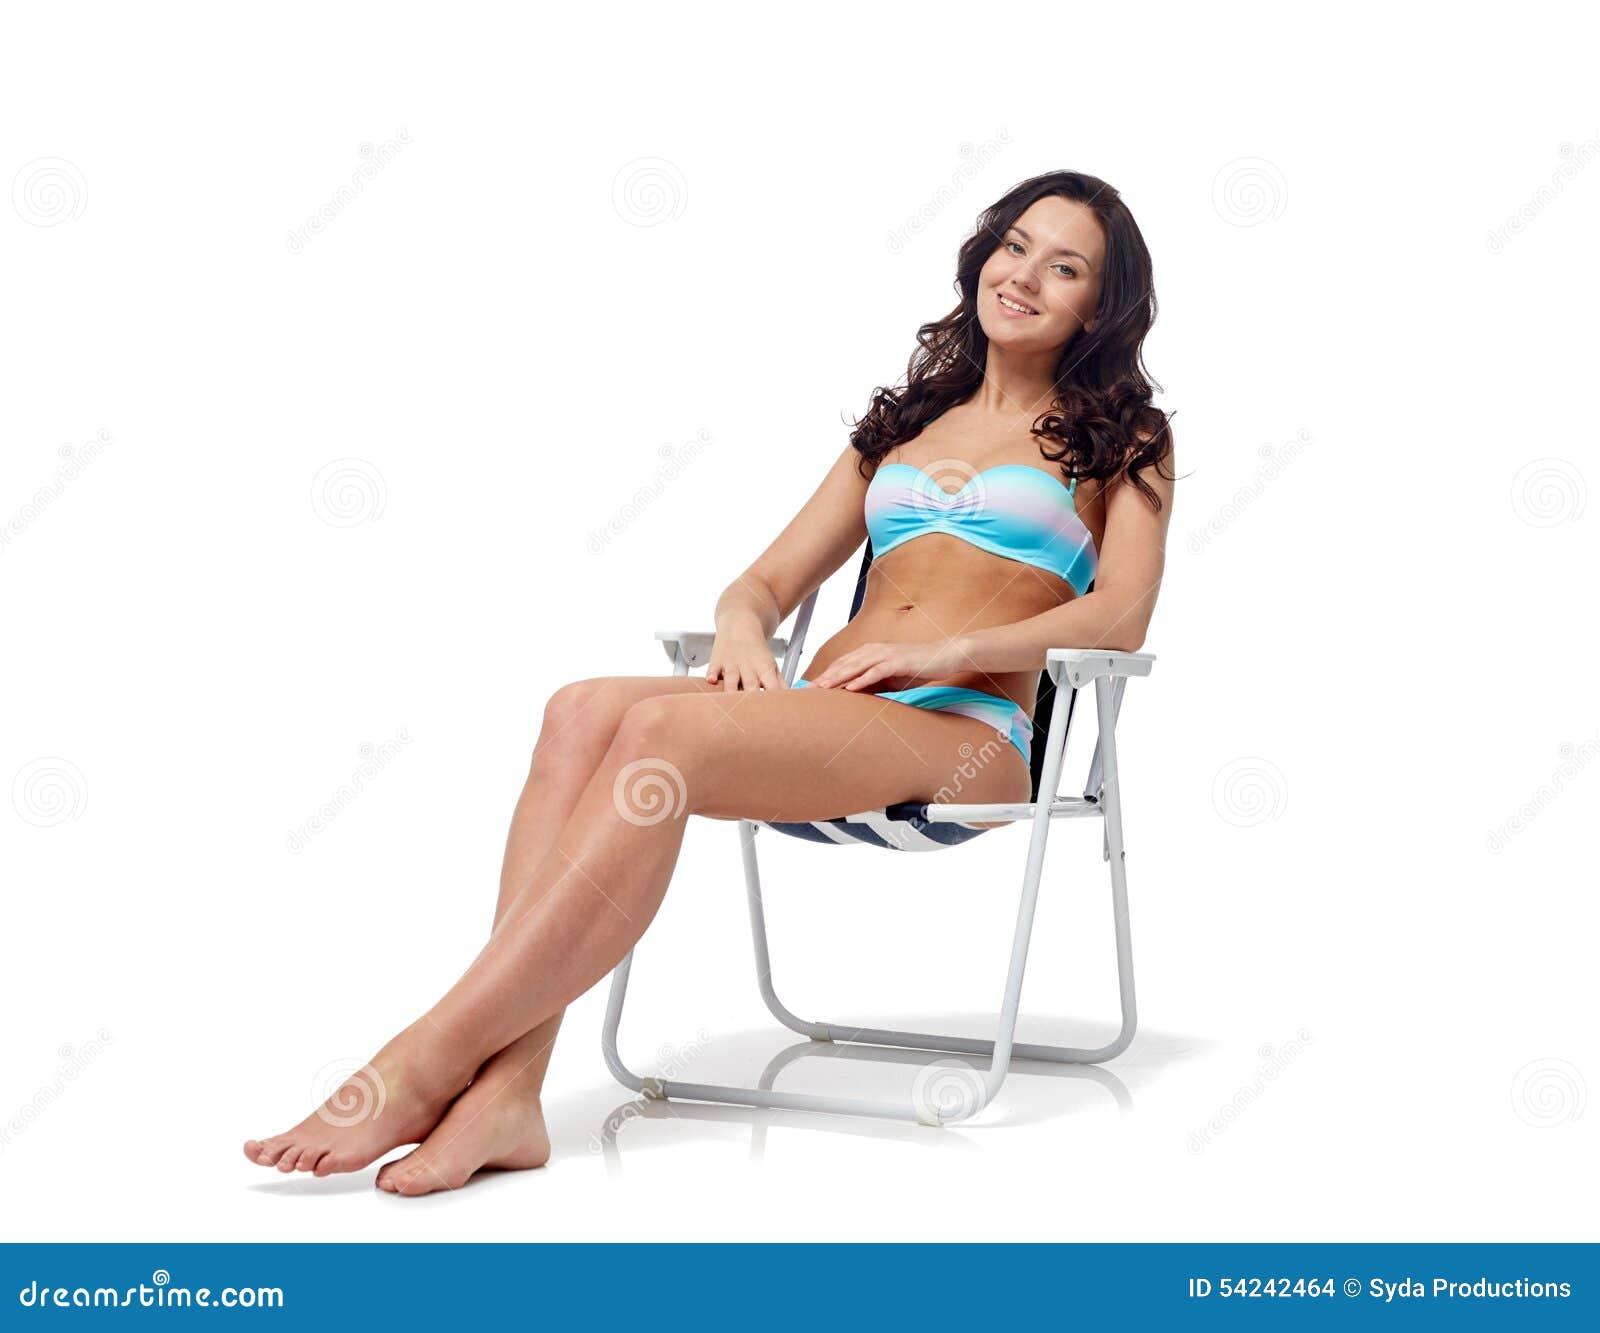 Fat women porn images download